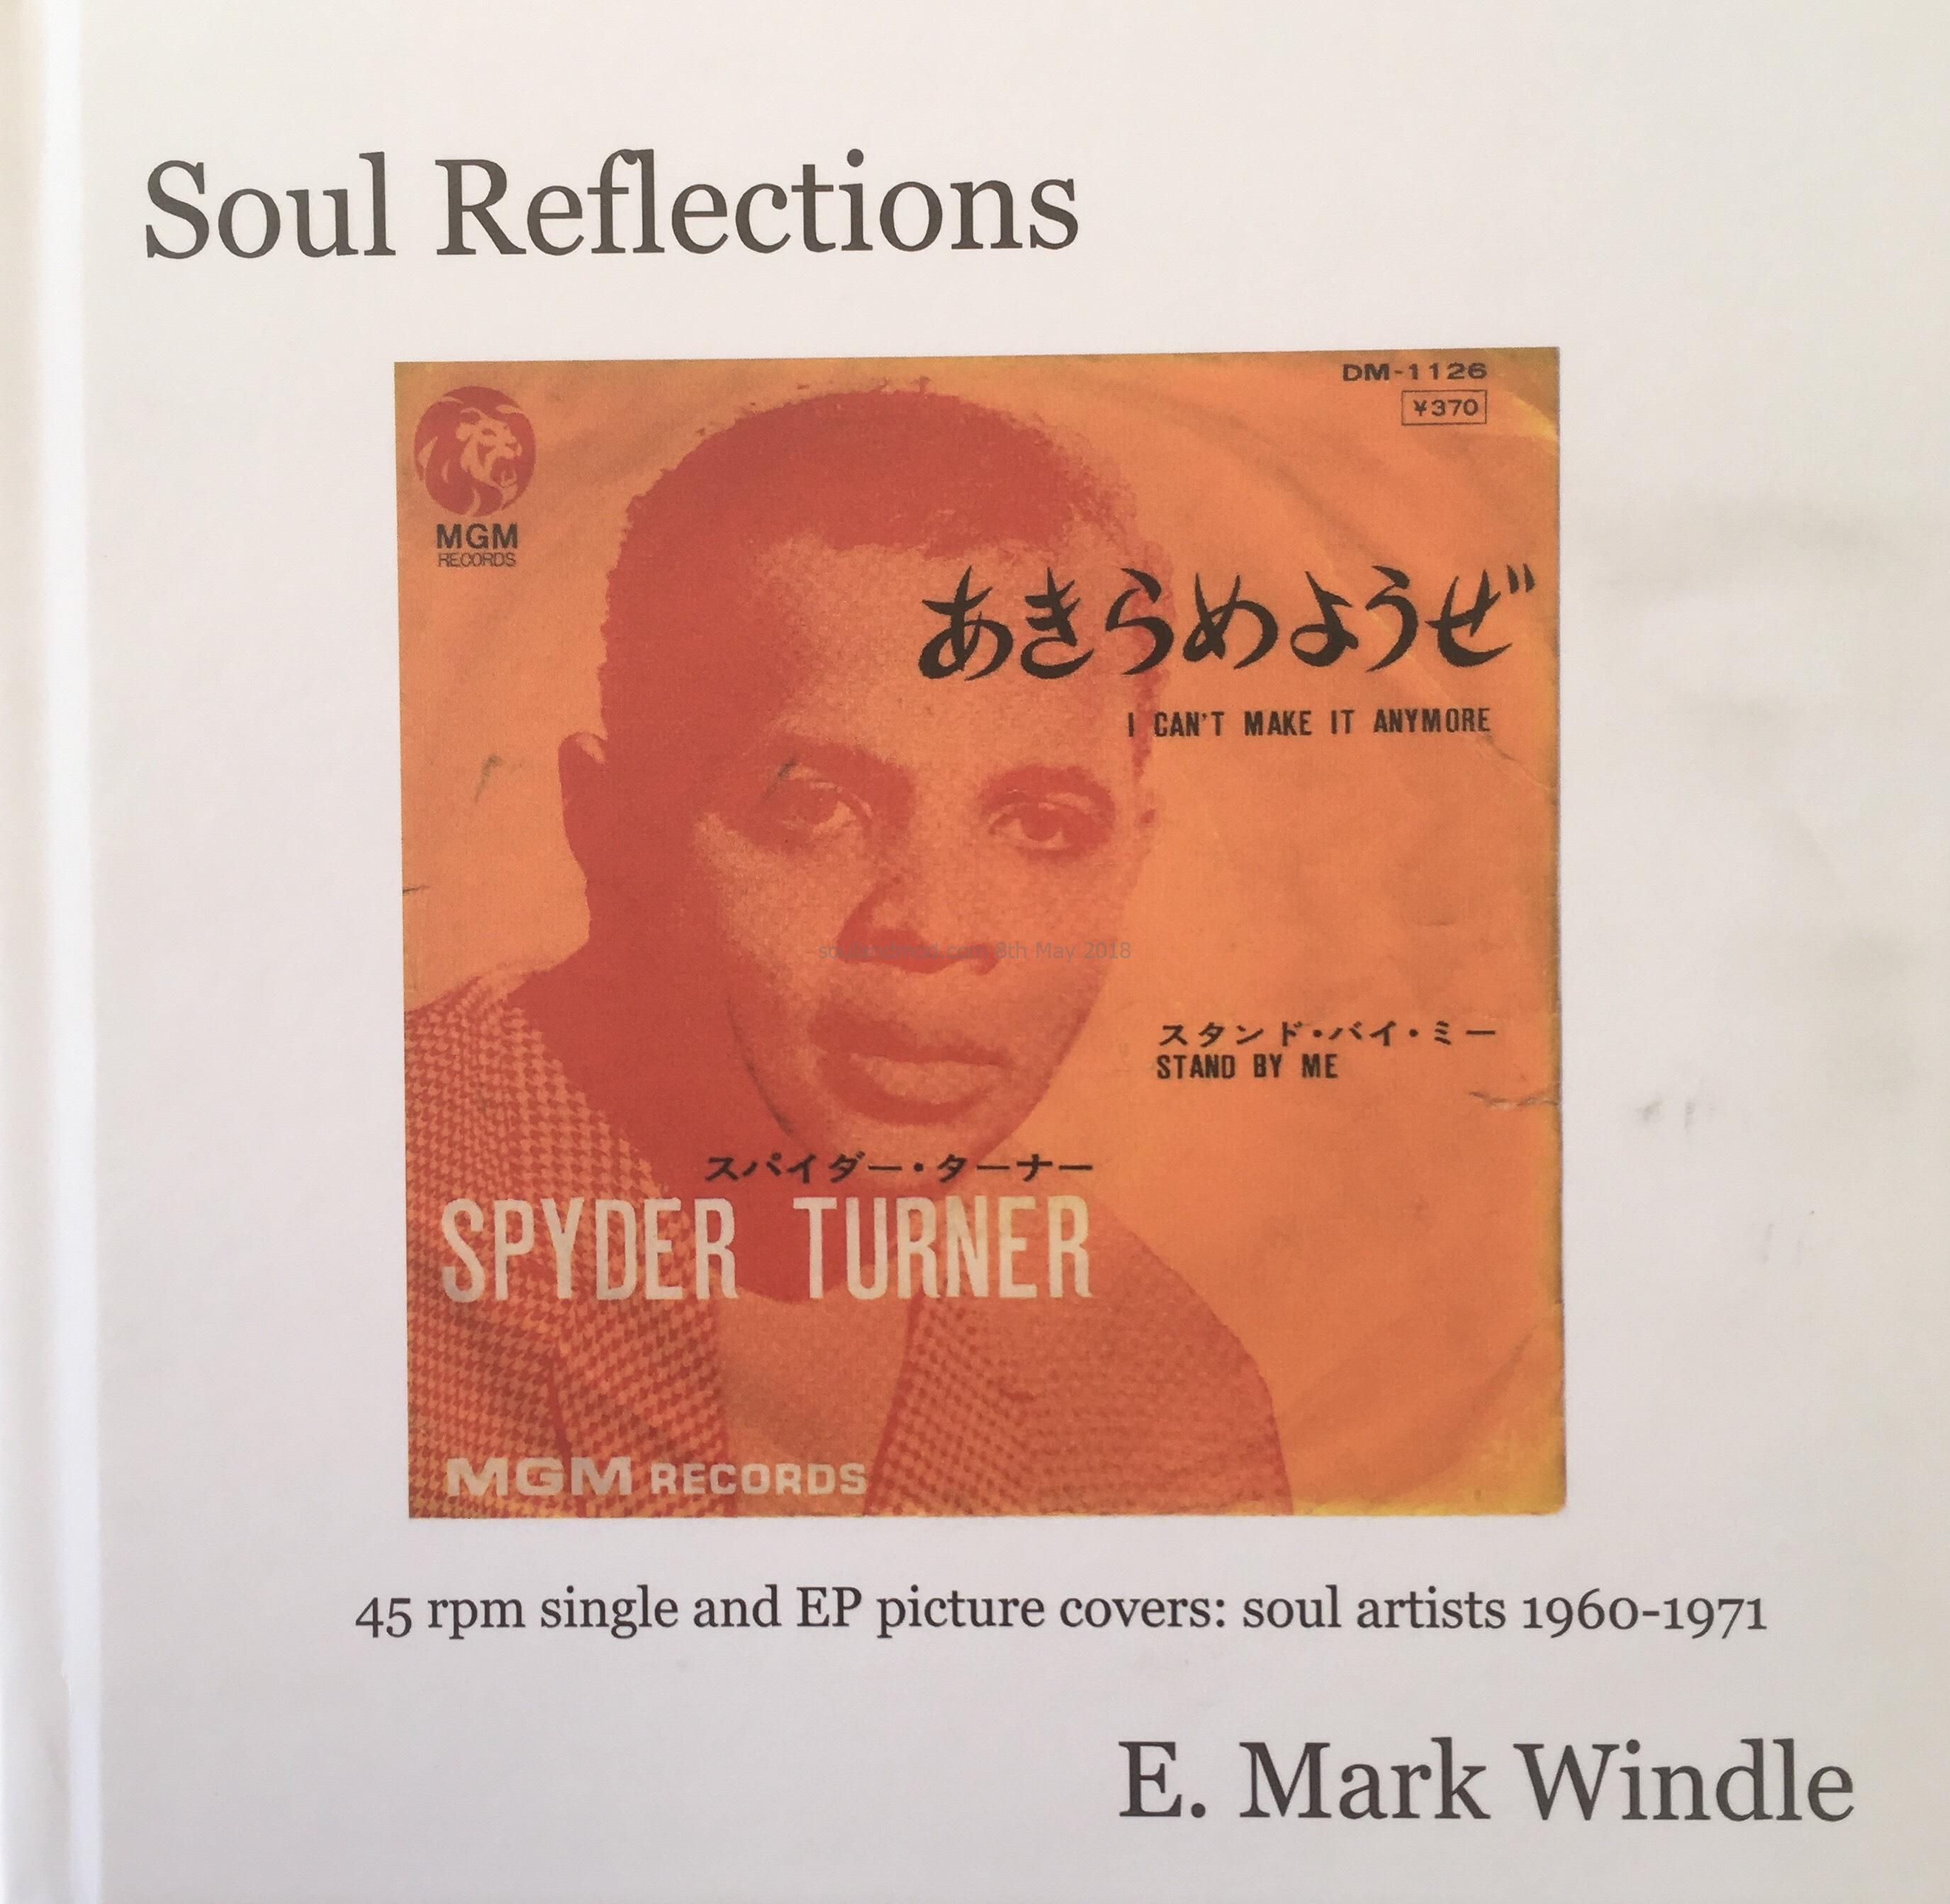 Soul Reflections - Soul Artists 1960-1971 - E. Mark Windle